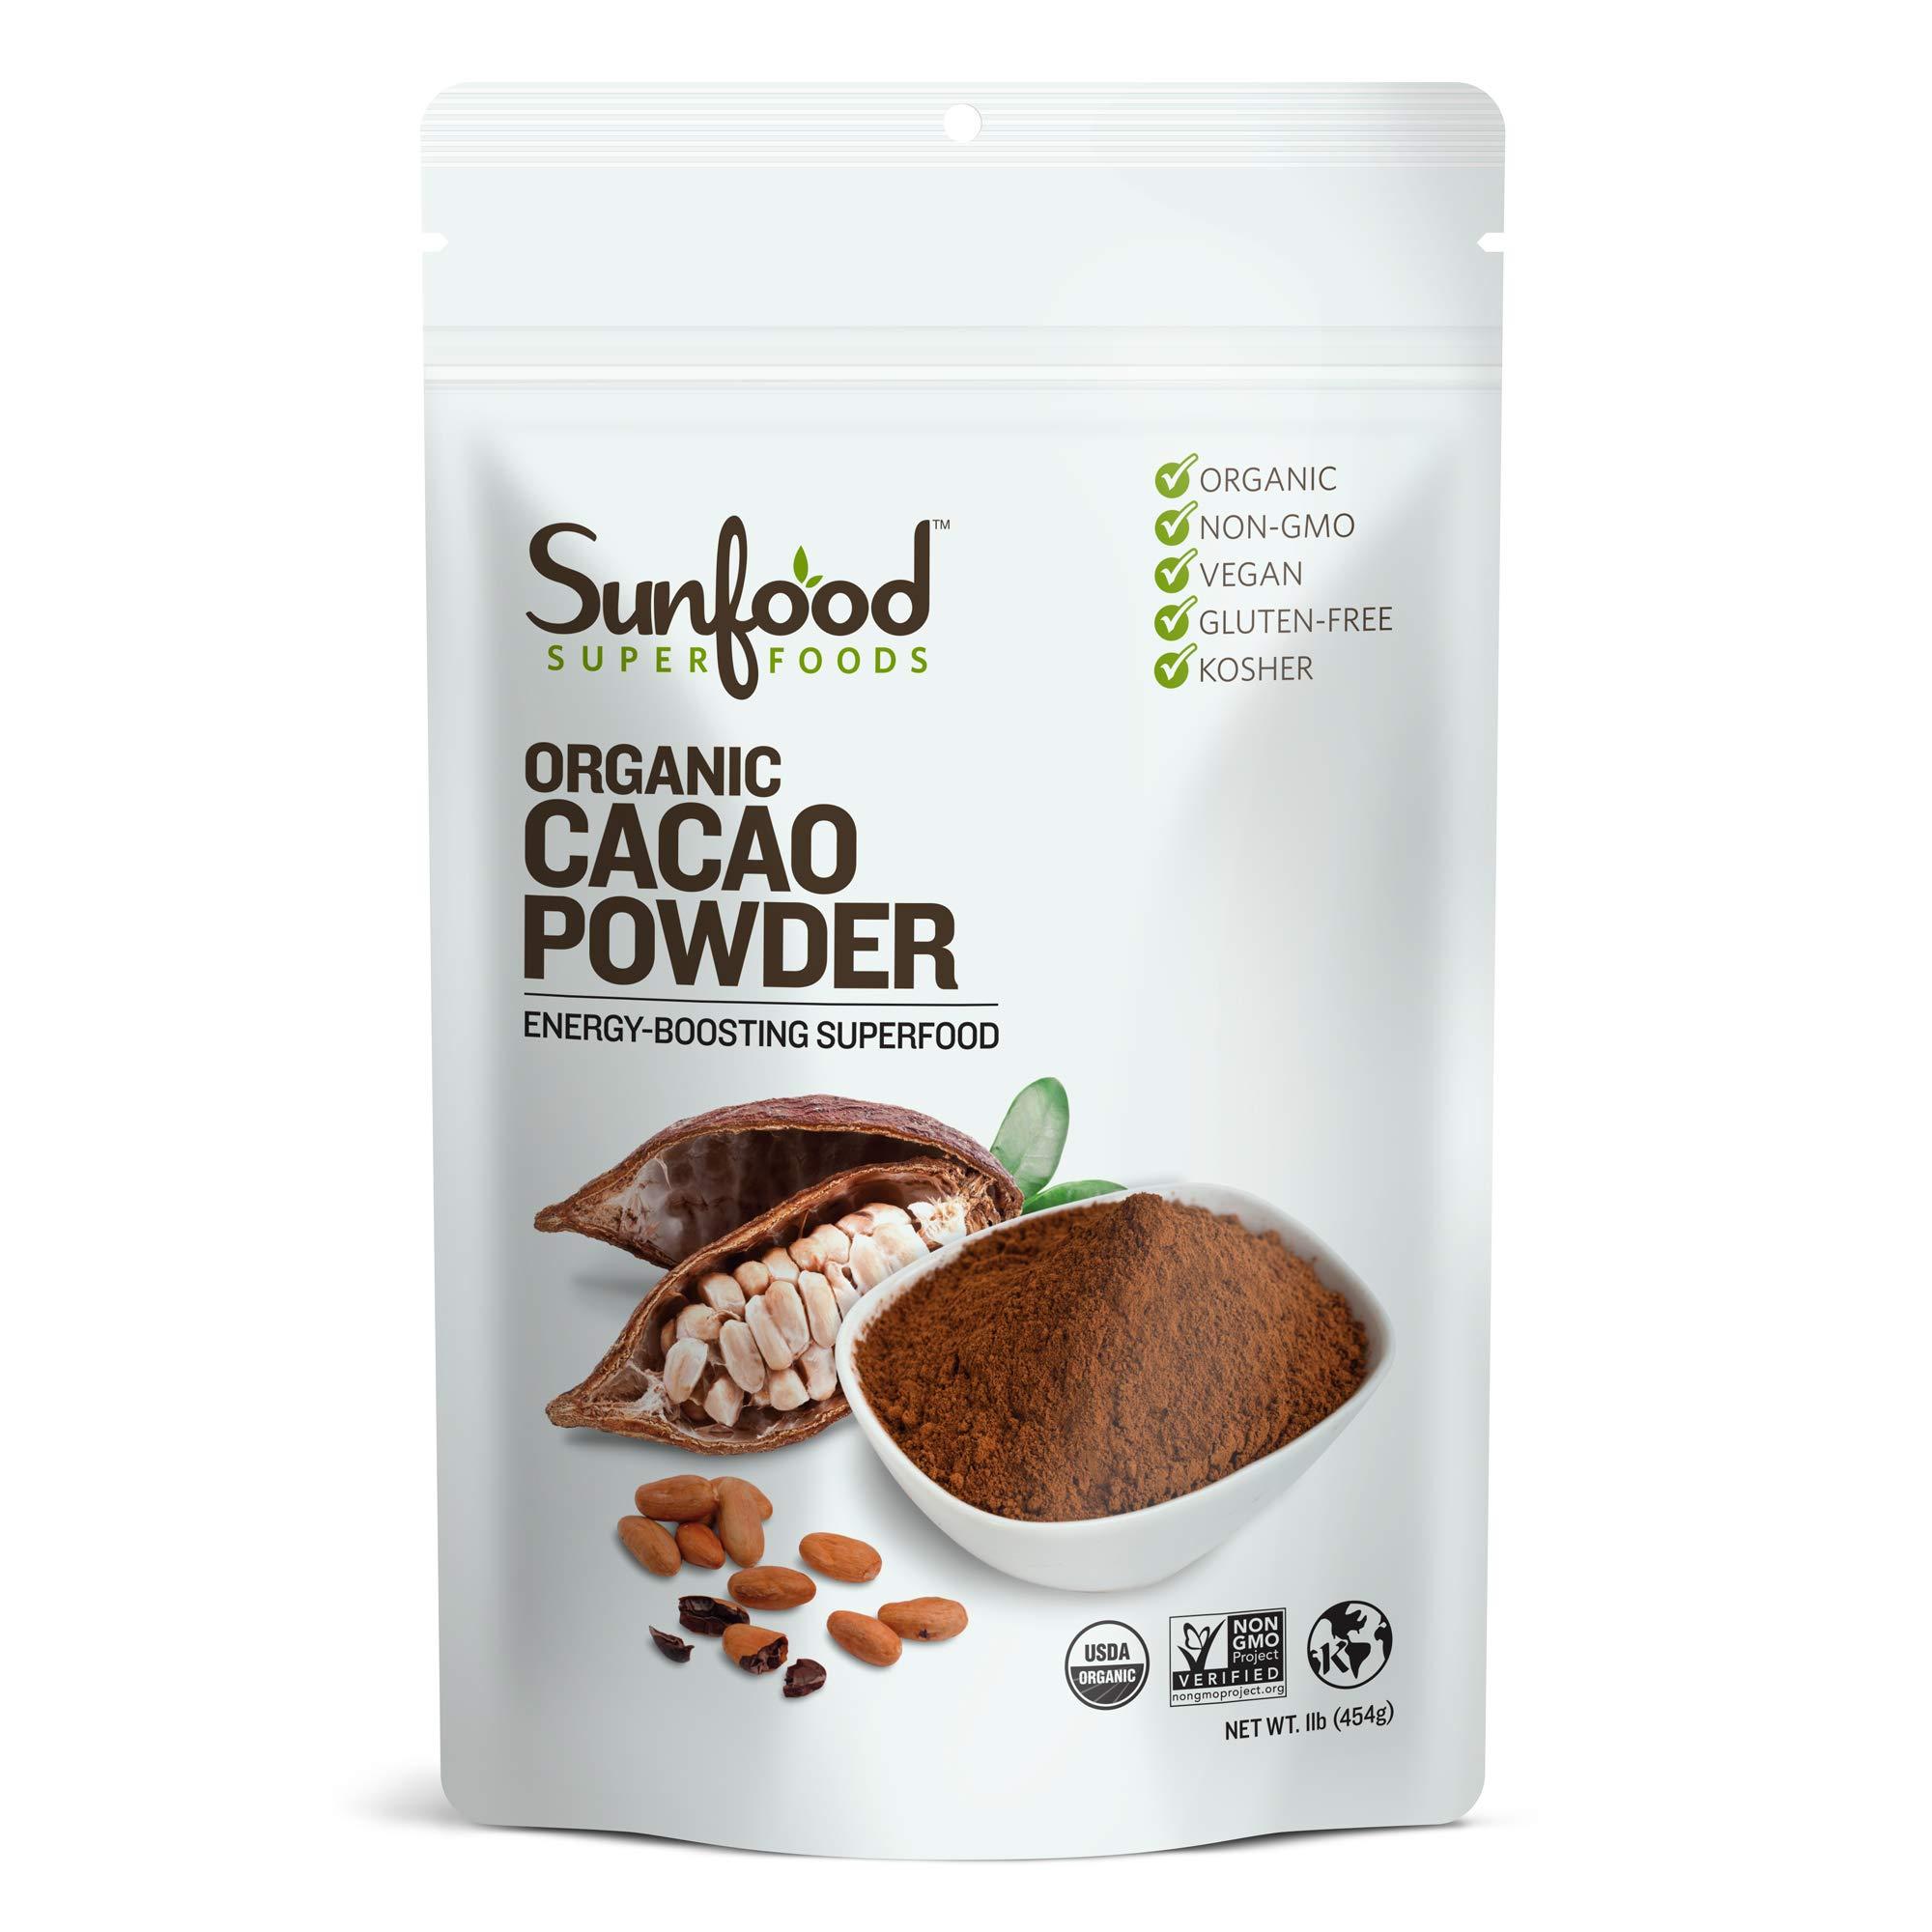 Sunfood Superfoods Cacao Powder- Pure Raw Organic. 1 lb Bag